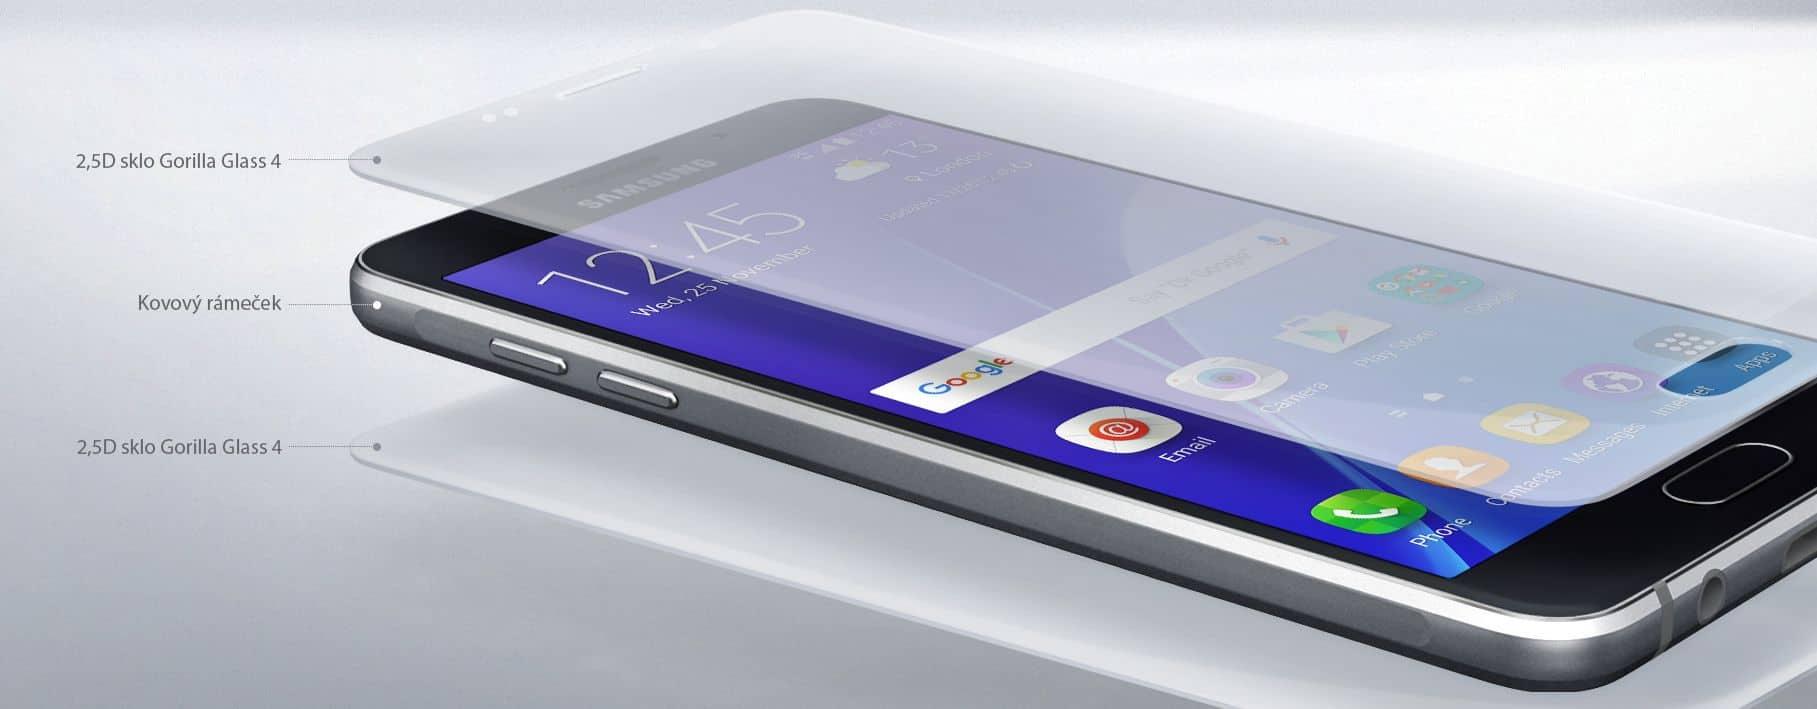 Samsung Galaxy A3_2016 title